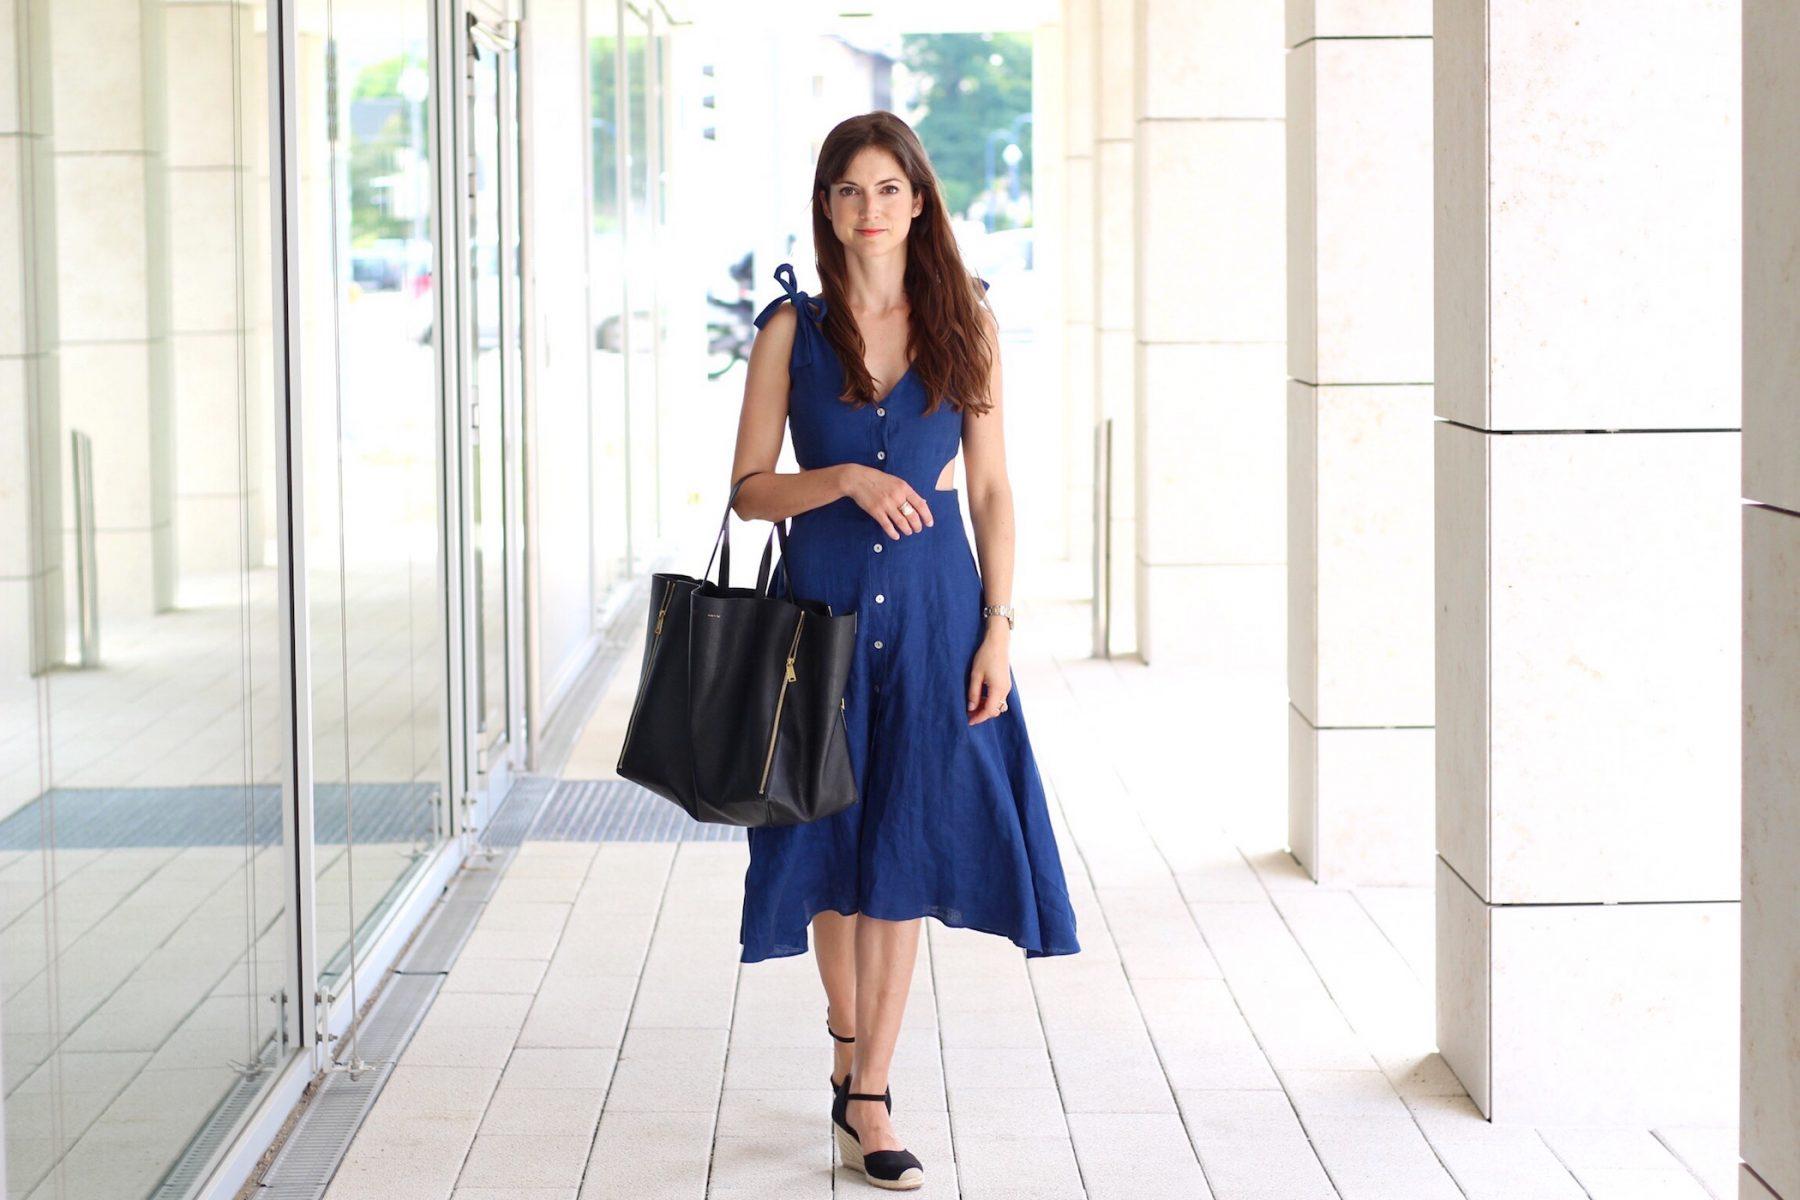 Nagelneu Outfit: Zara Cut-Out Midikleid, Céline Cabas Bag und schwarze  VI56